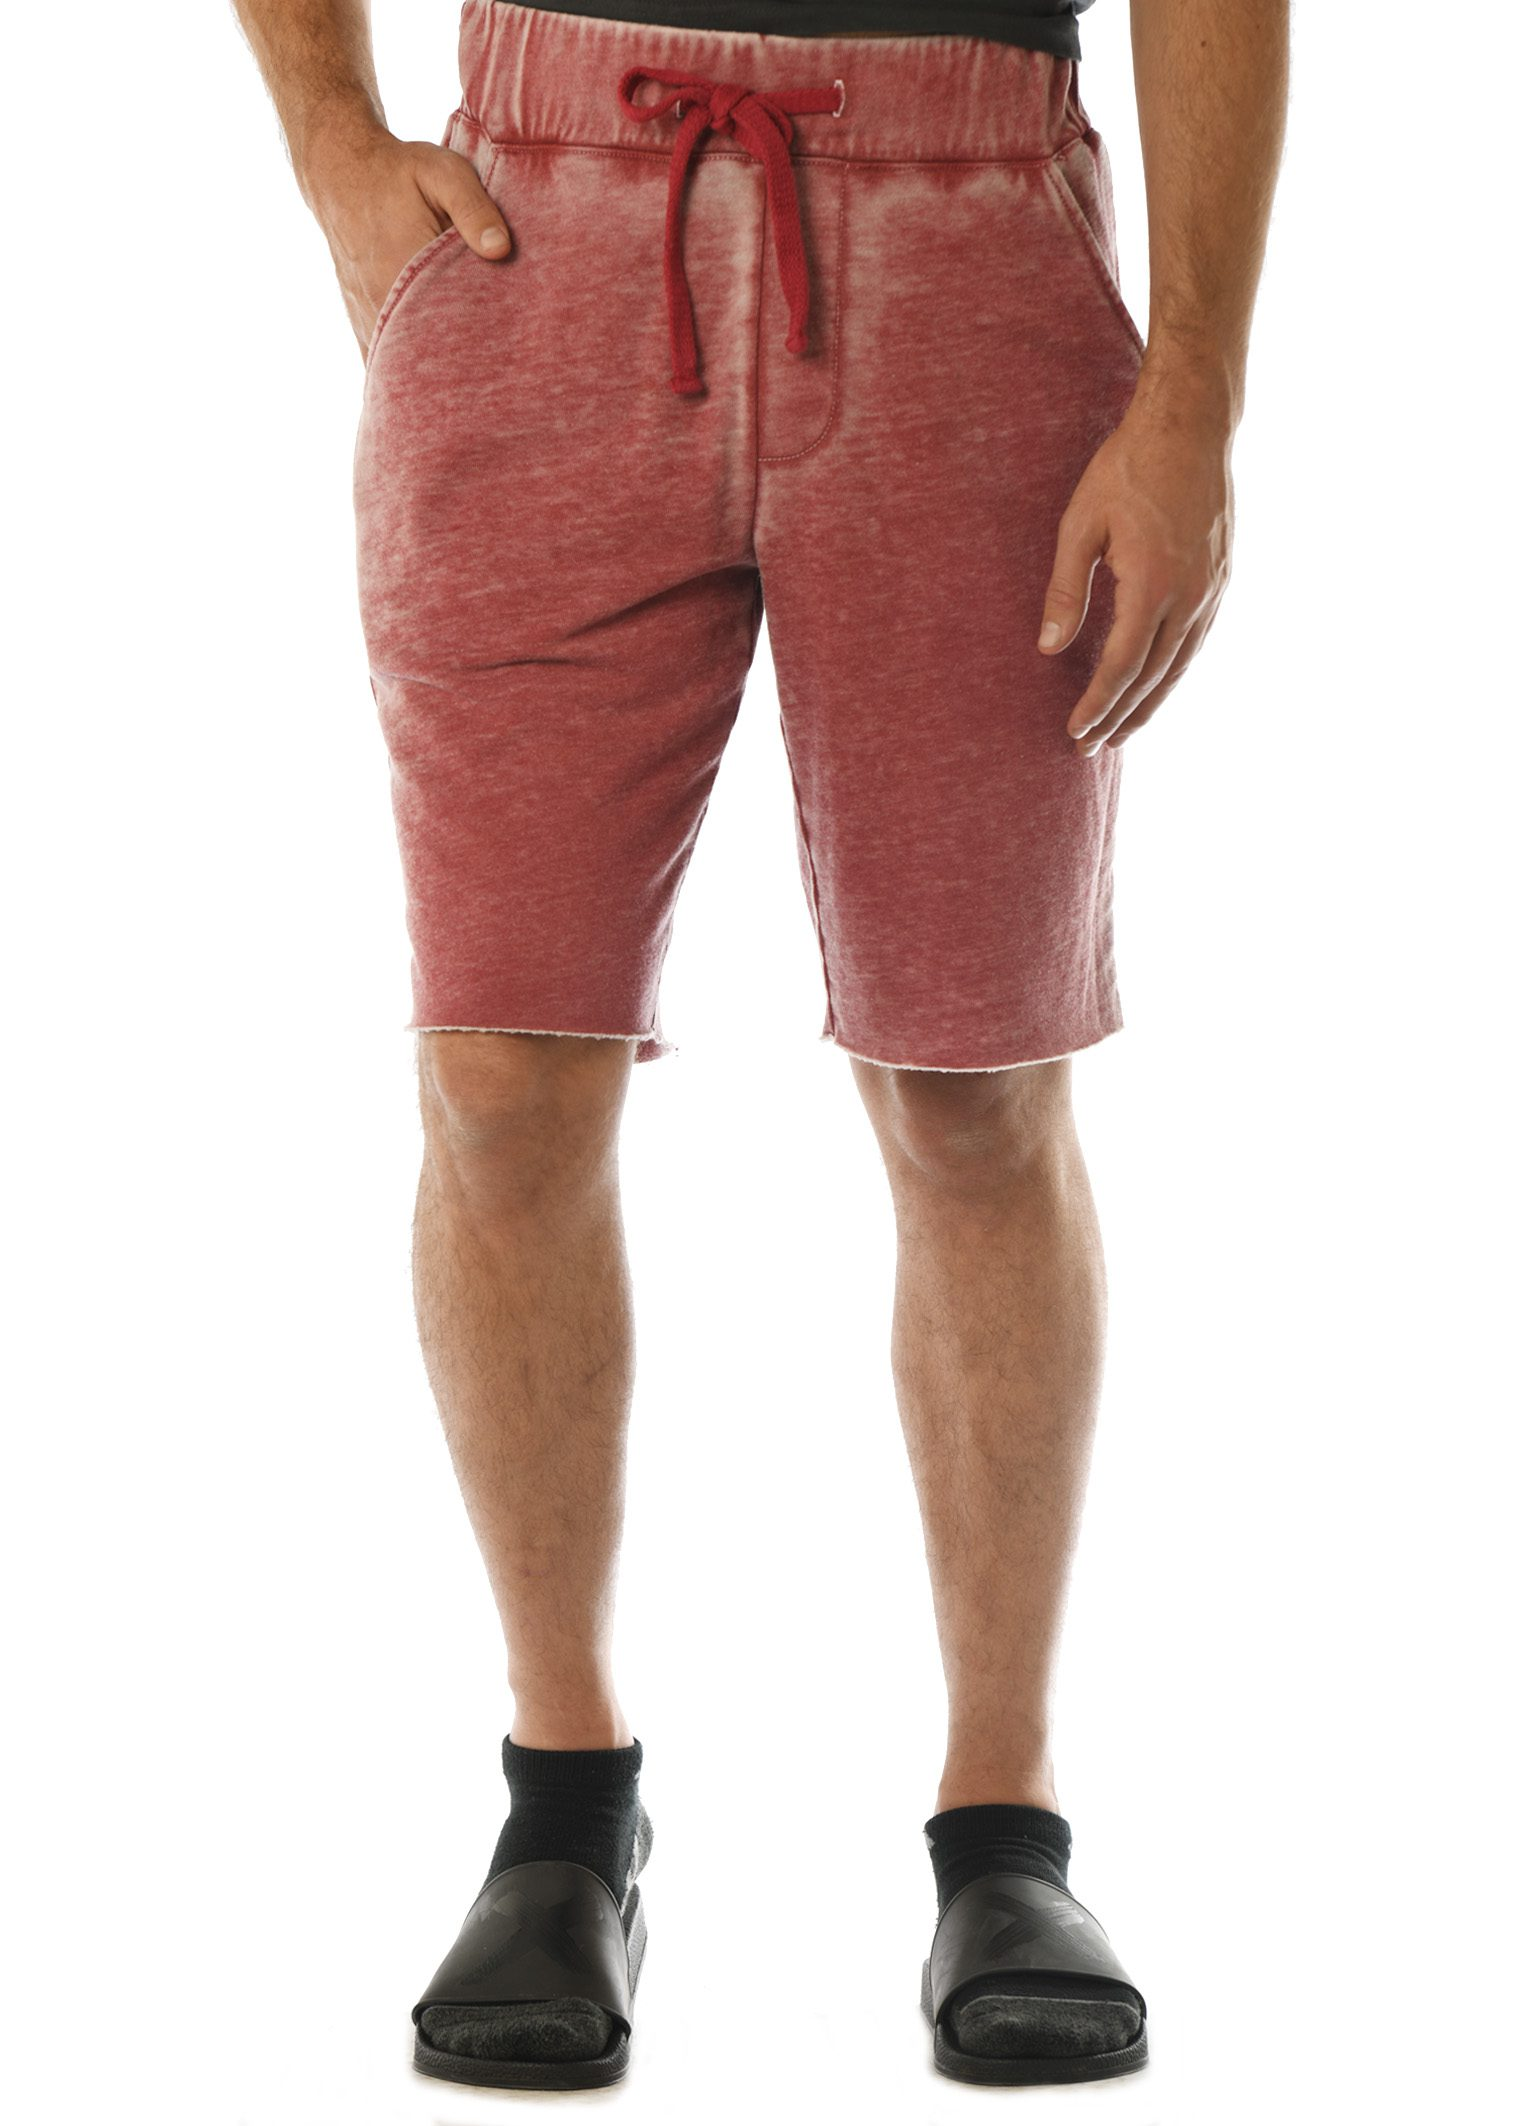 GG 315-FT-B Men's WornWash Shorts-front